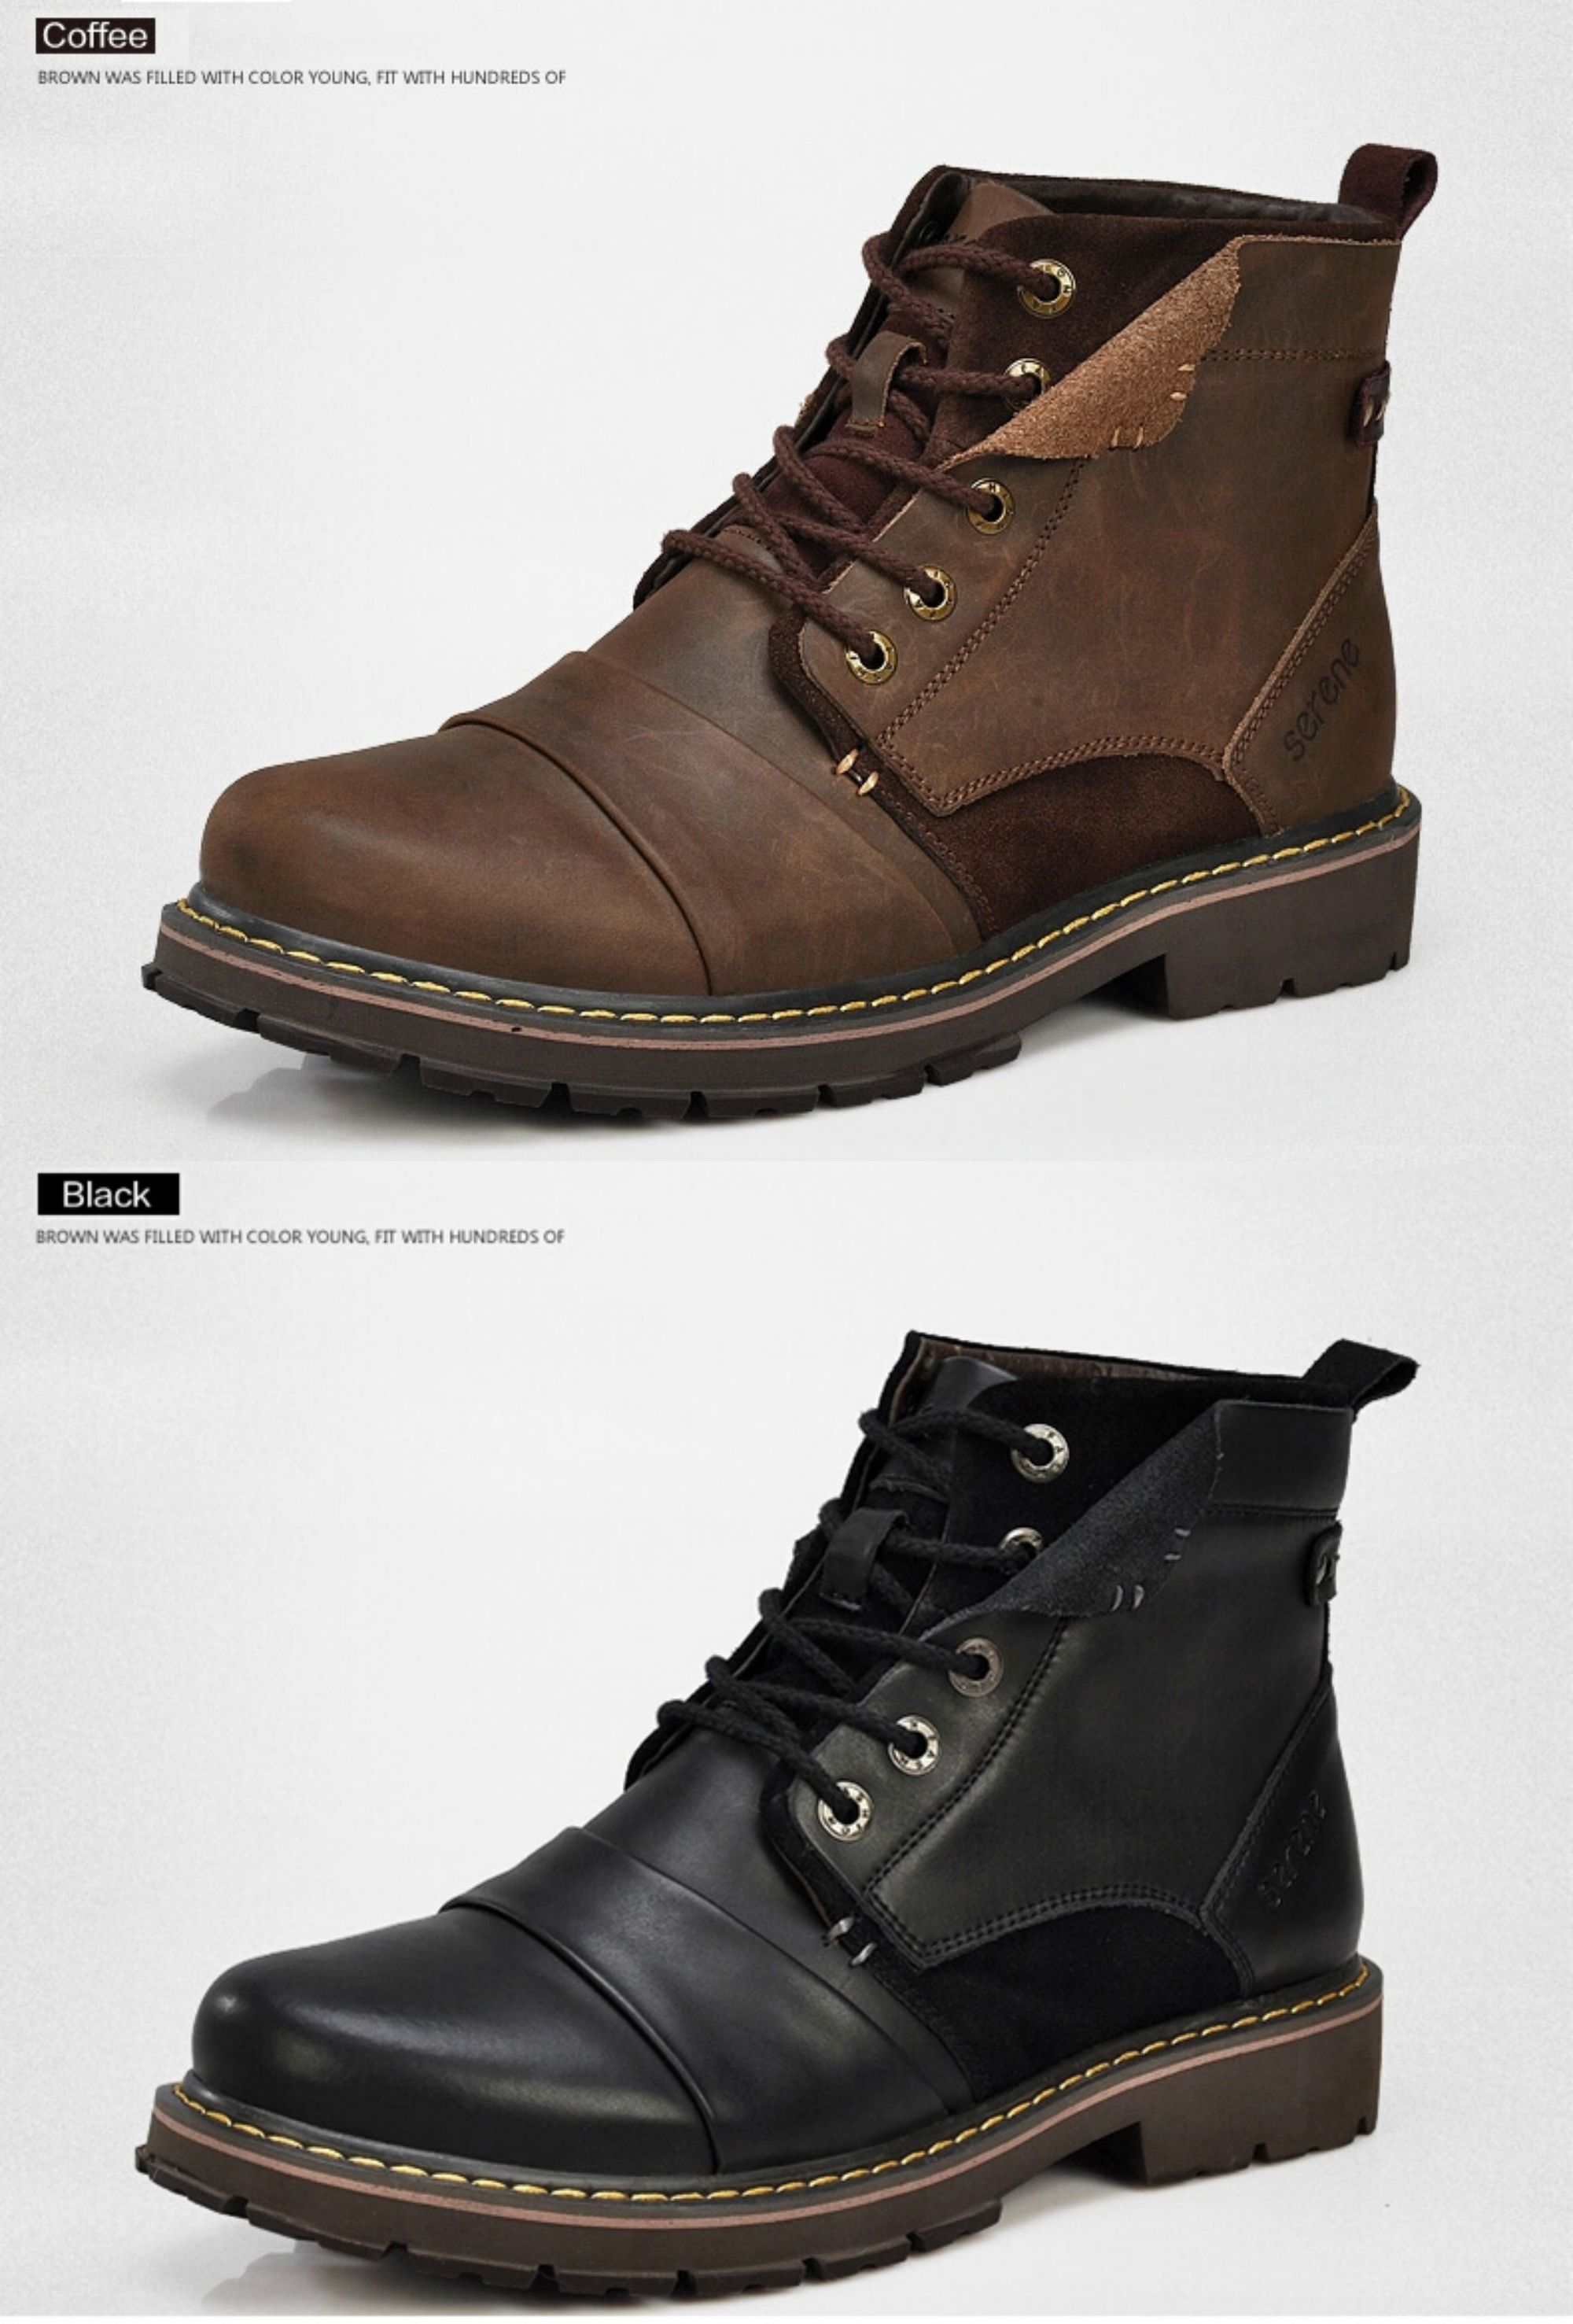 Man Confortevole Warm Für Fodera Leather Lacci Up Boots - Shoes JViUTngQo